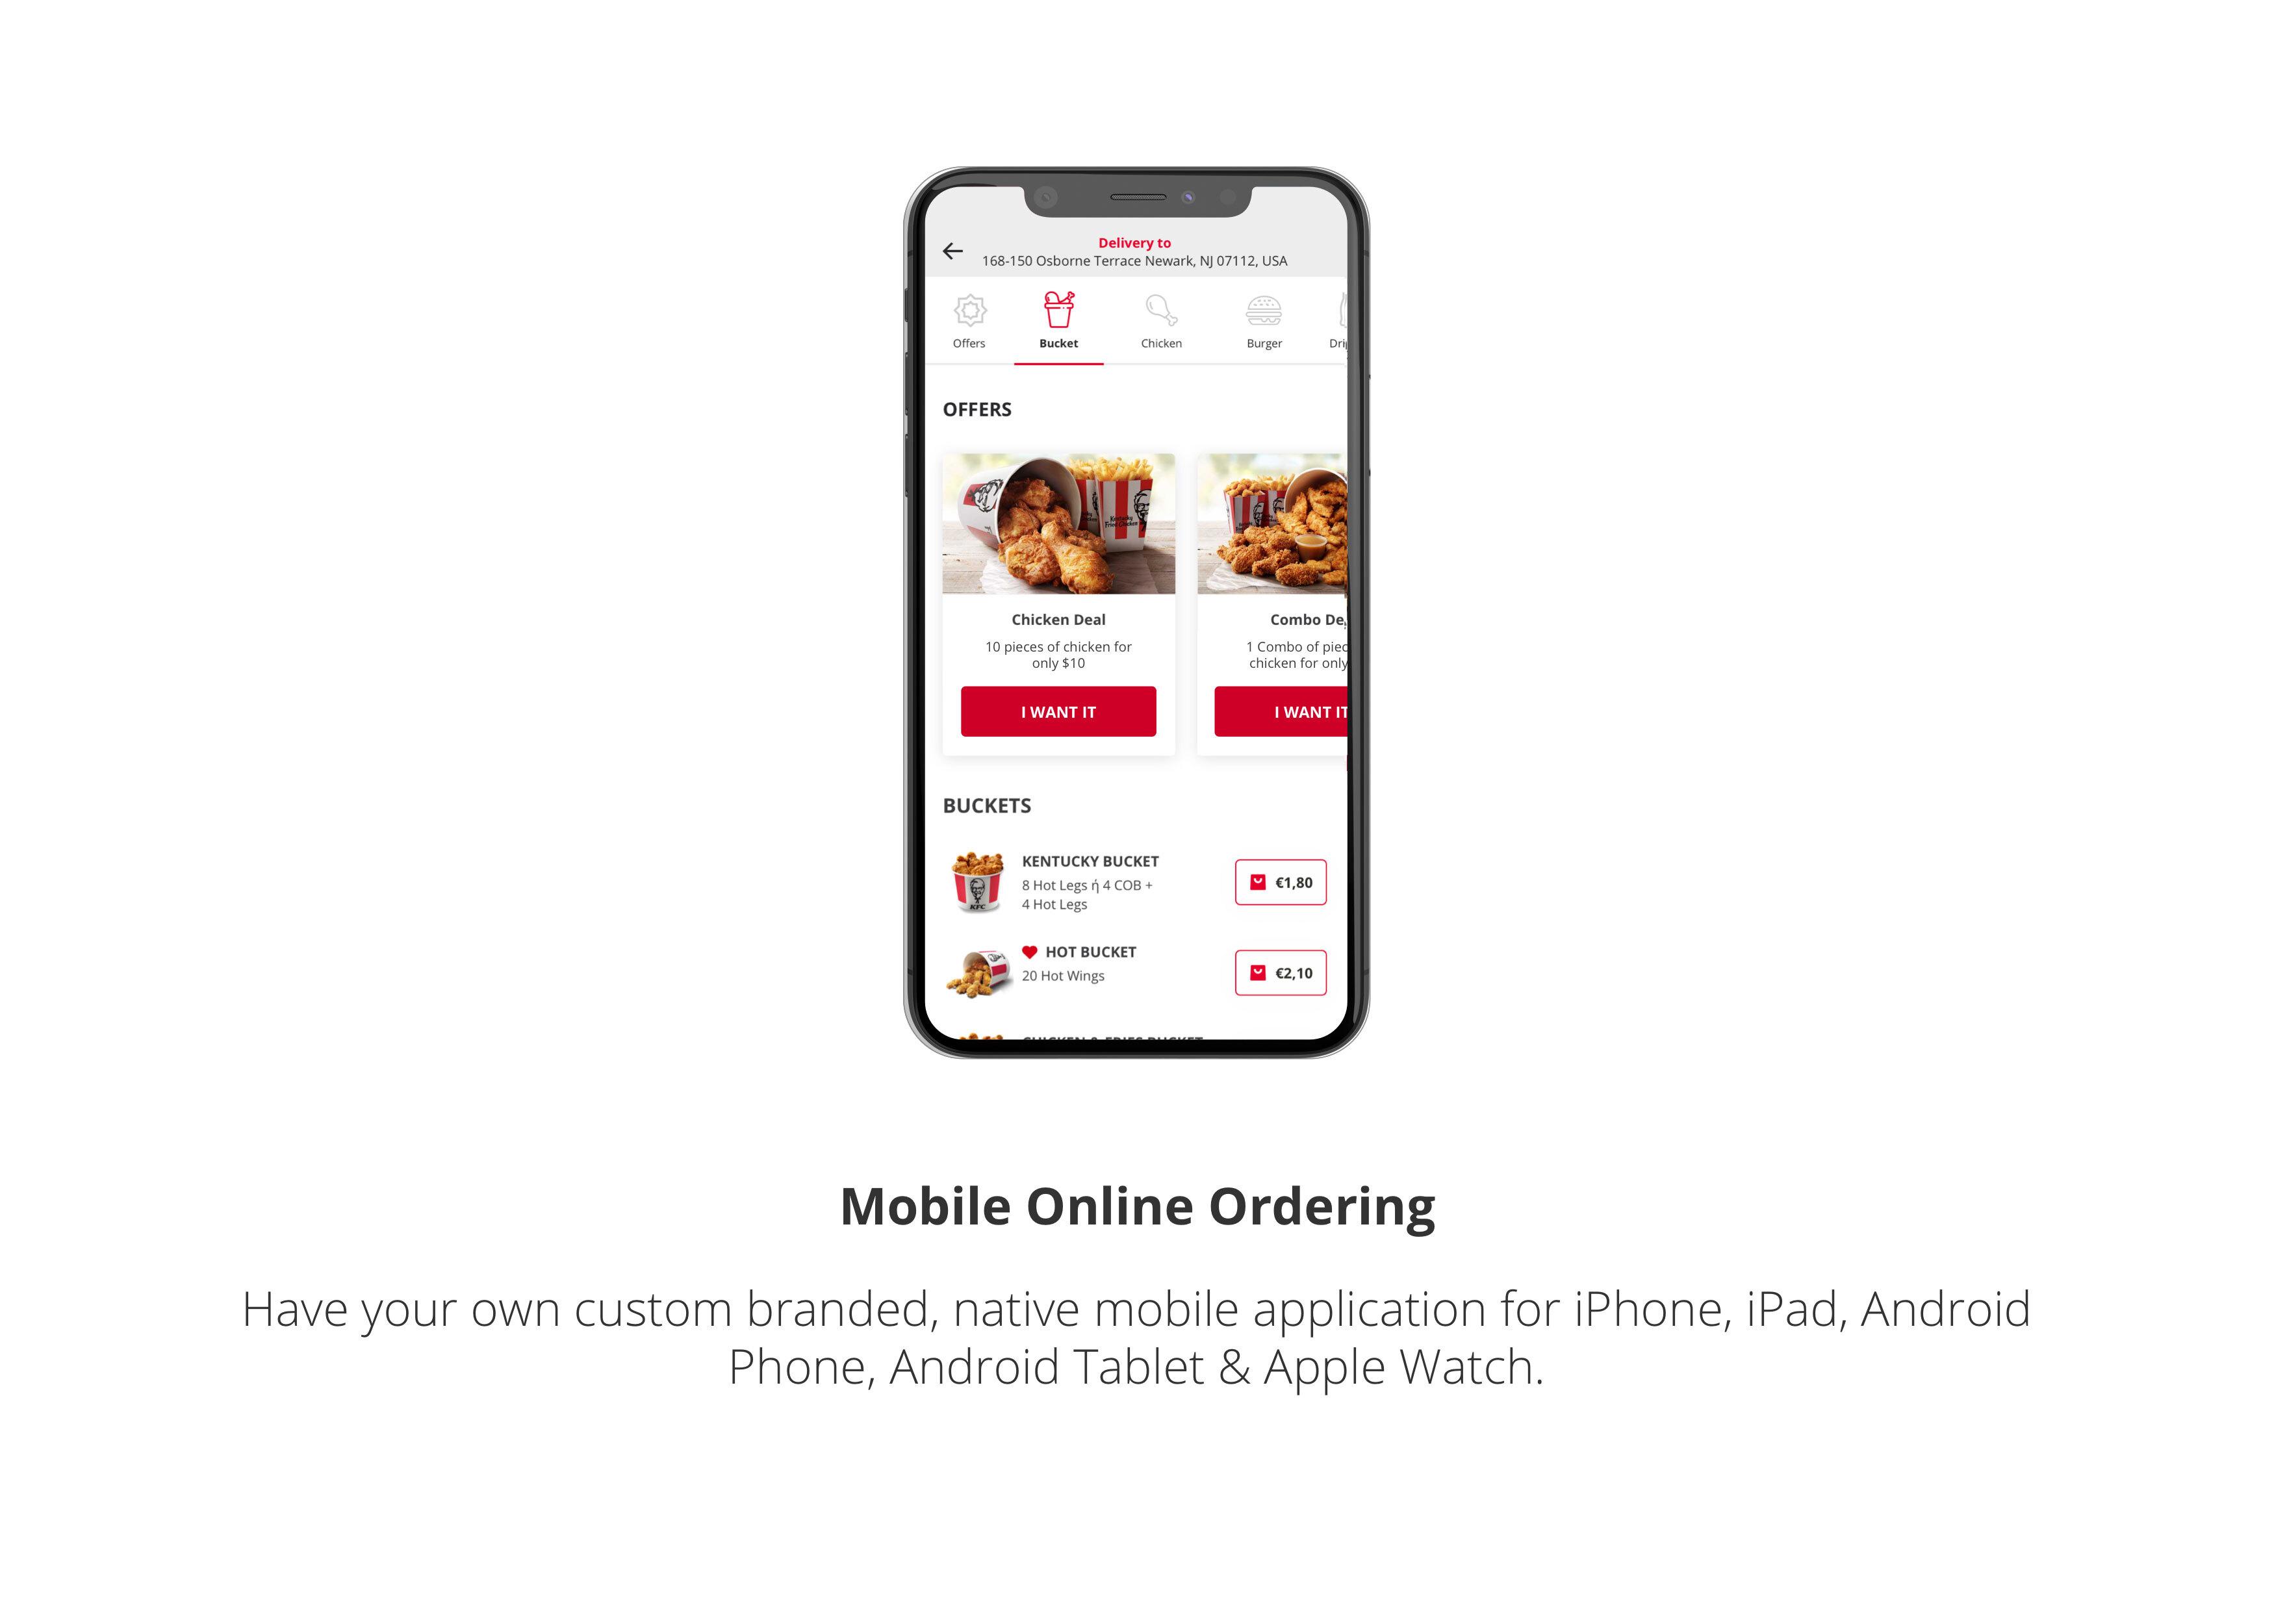 Mobile Online Ordering